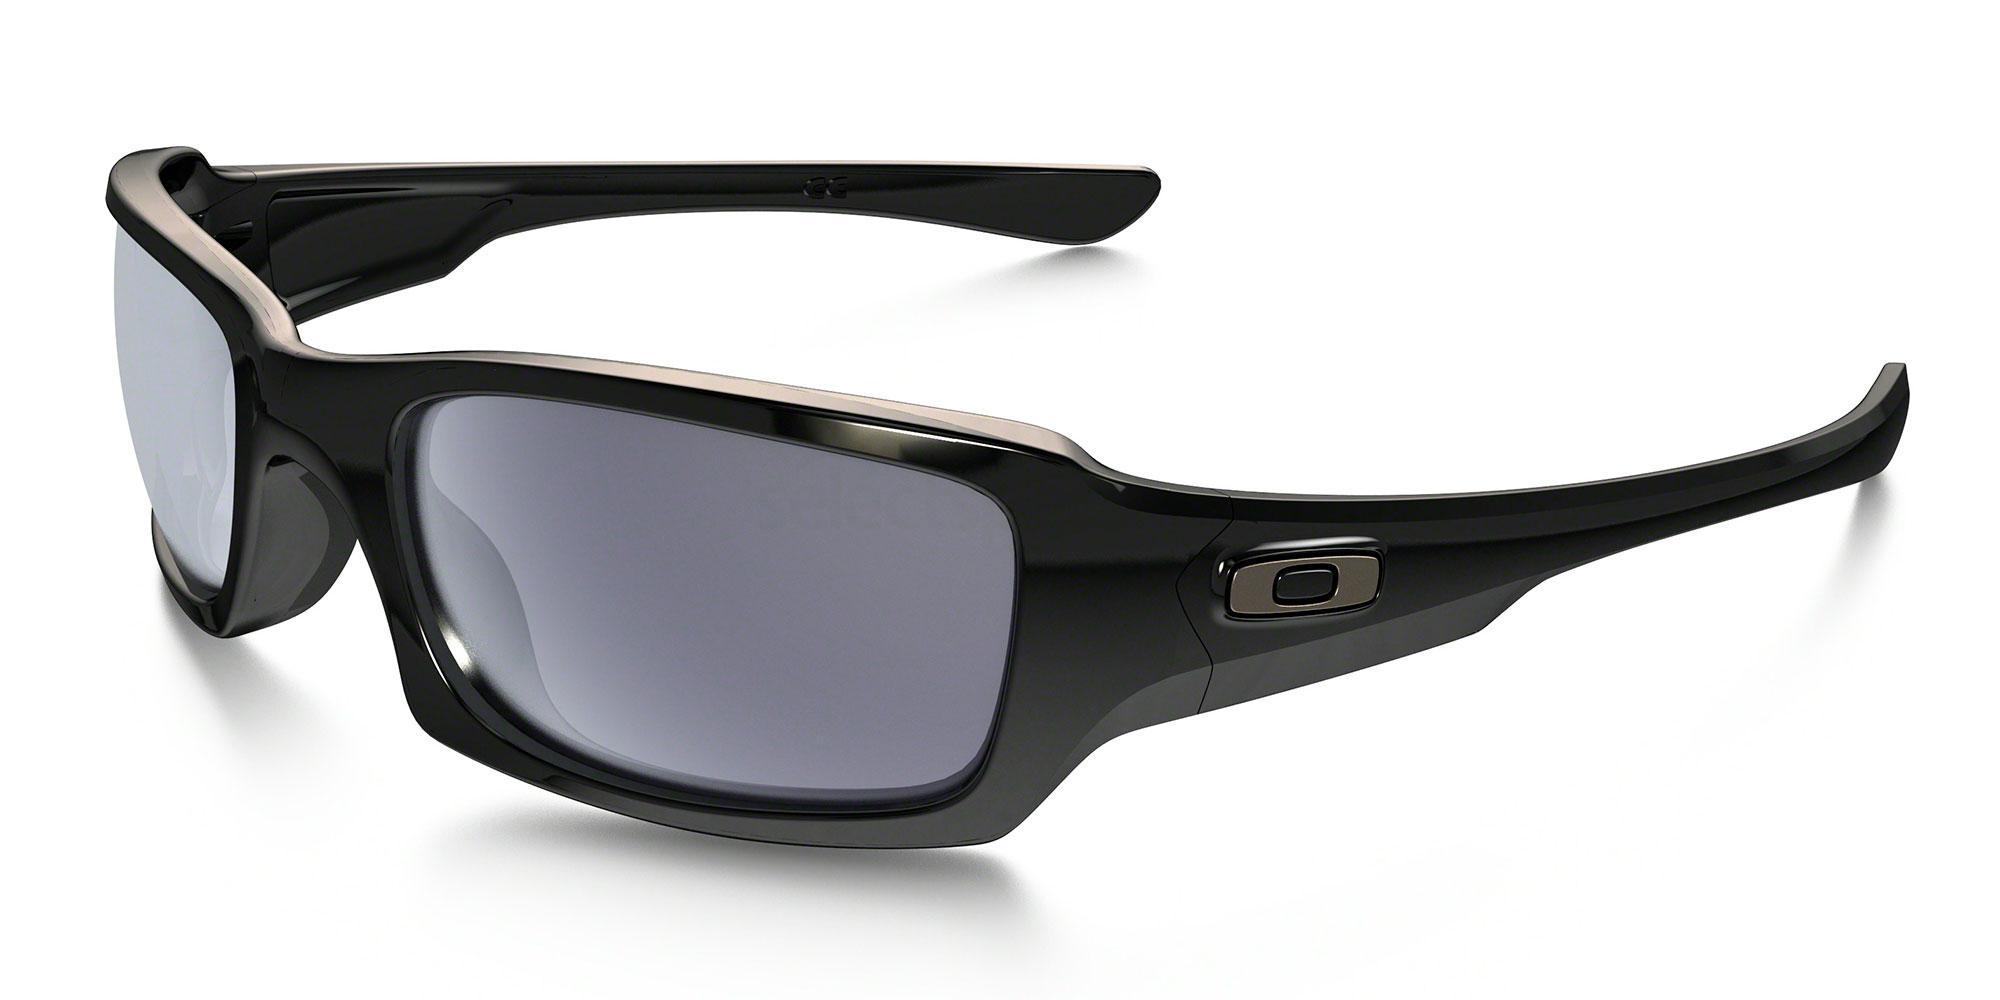 Oakley_OO9238_Fives_squared_sunglasses